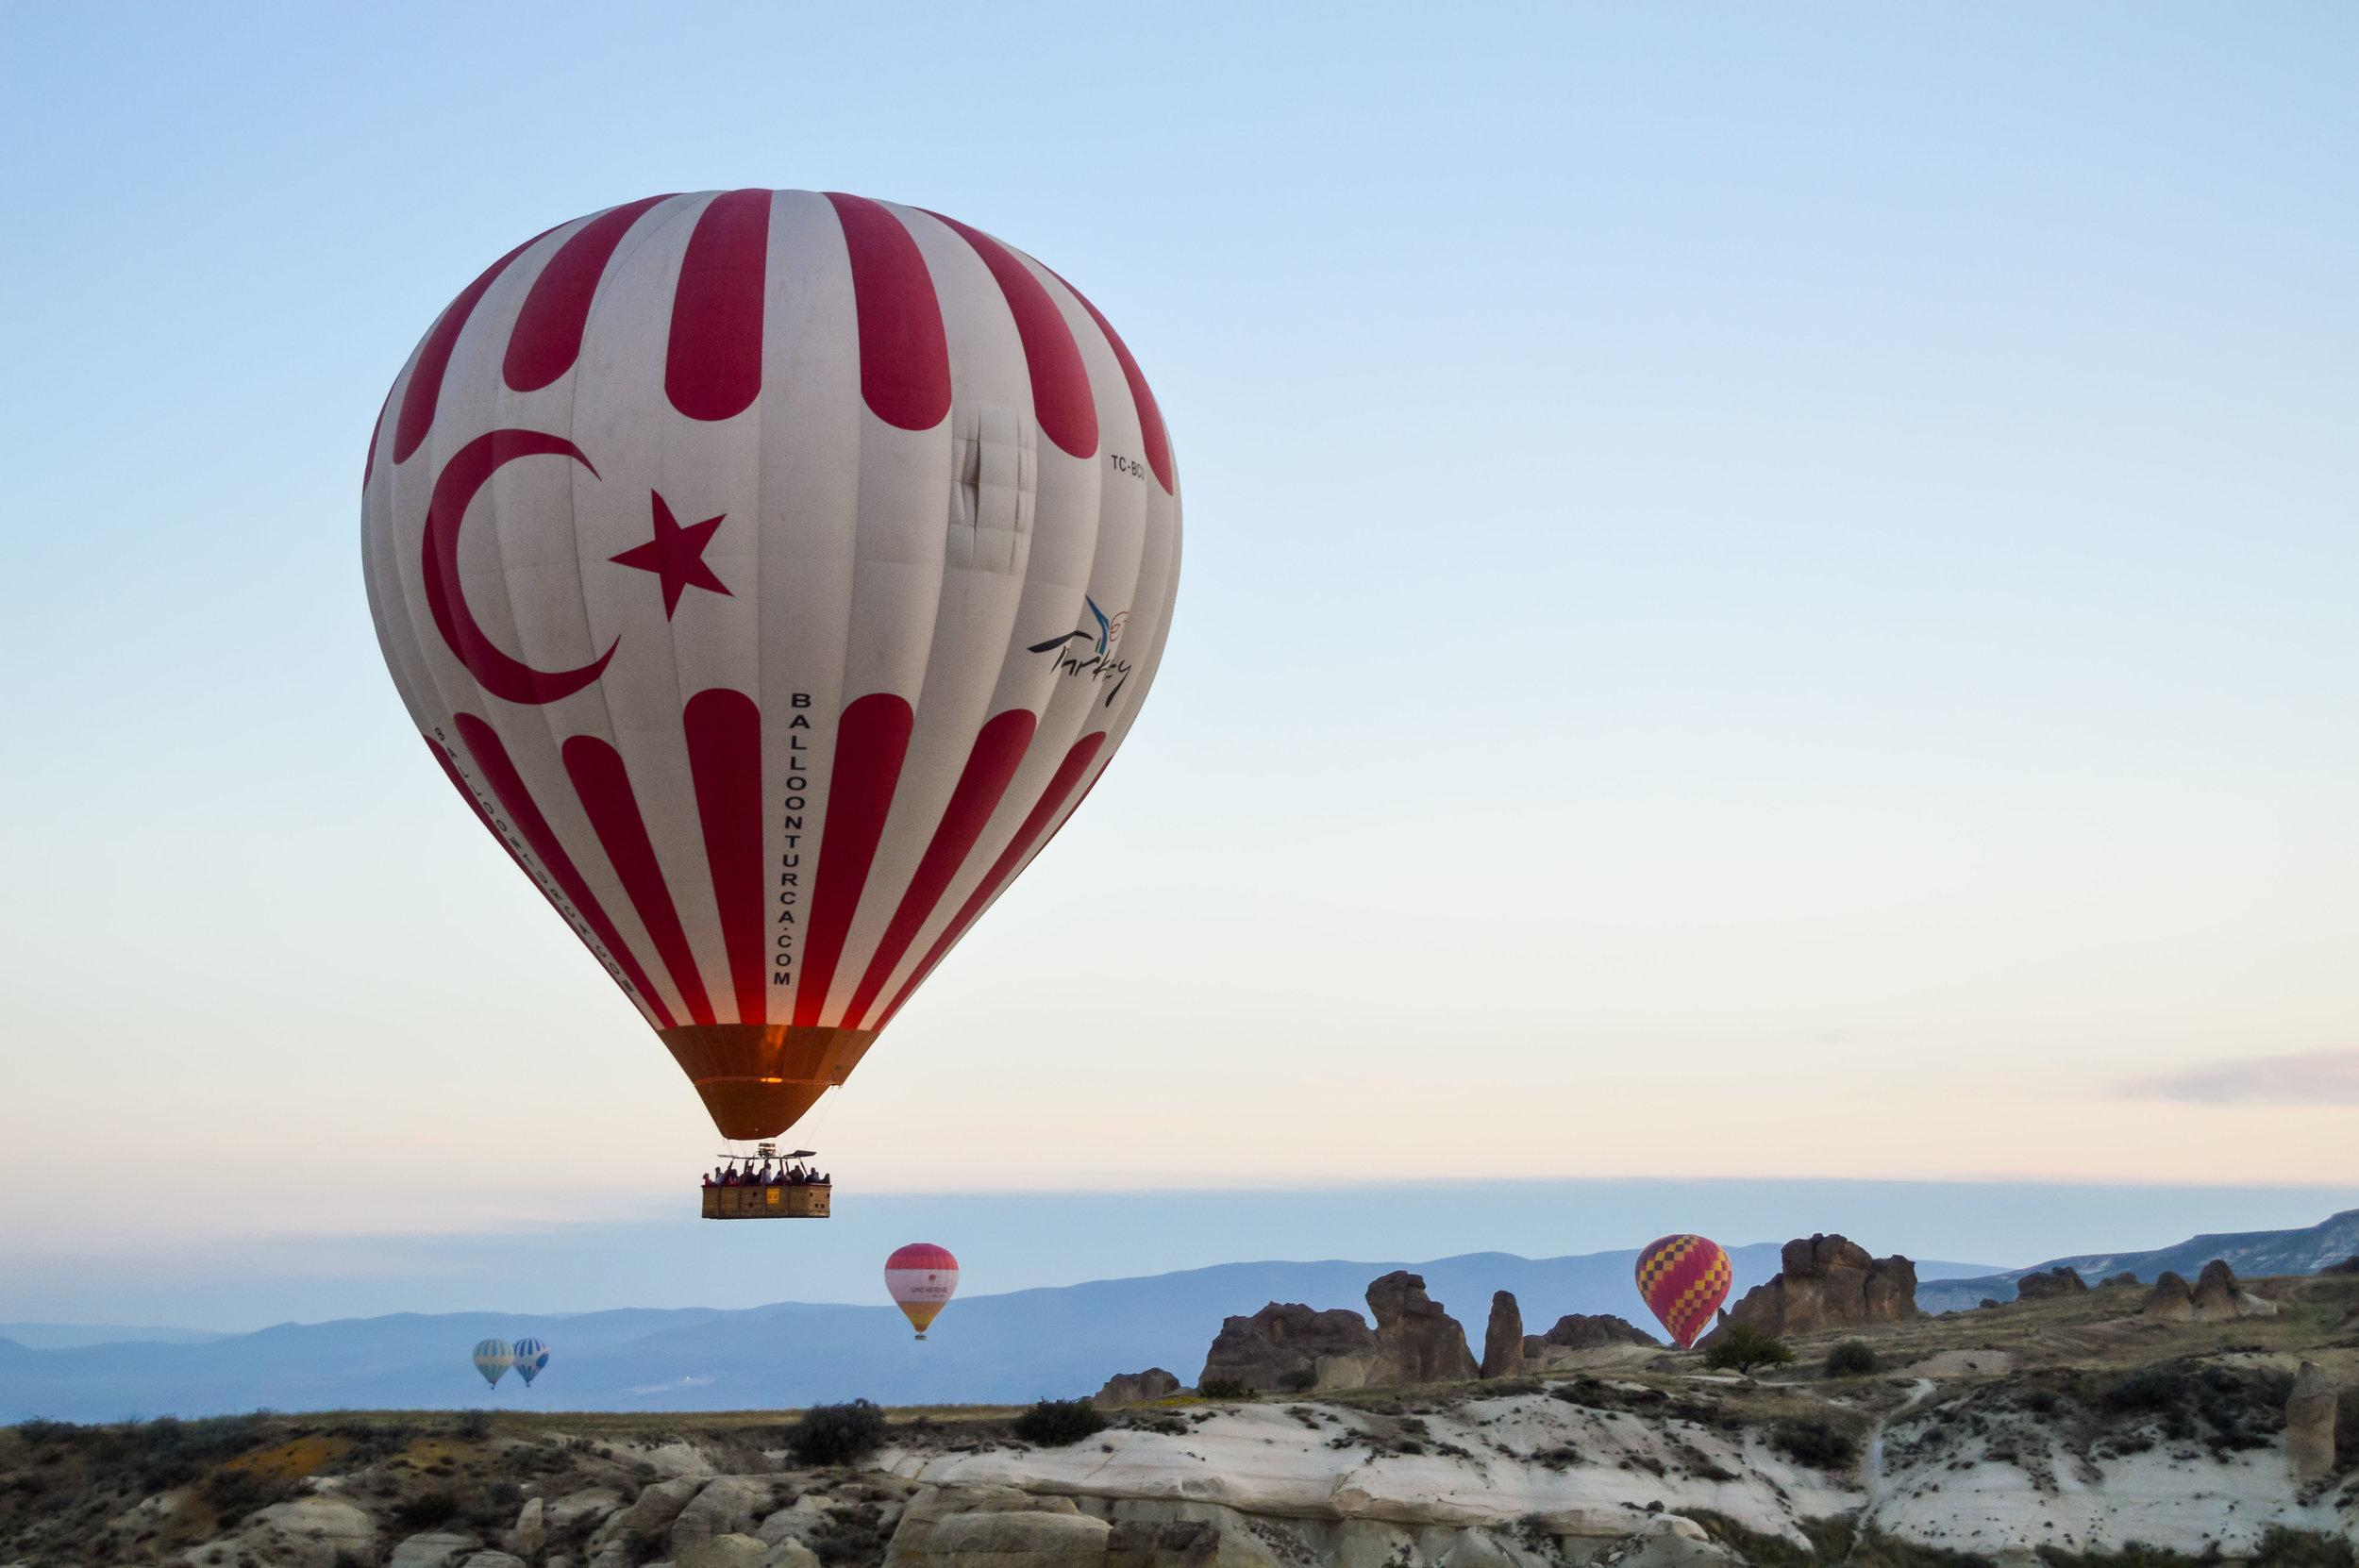 Hot Air Balloons Skyline Sunset Blue Sky Turkey Cappadocia Anatolia Göreme Desert Arid